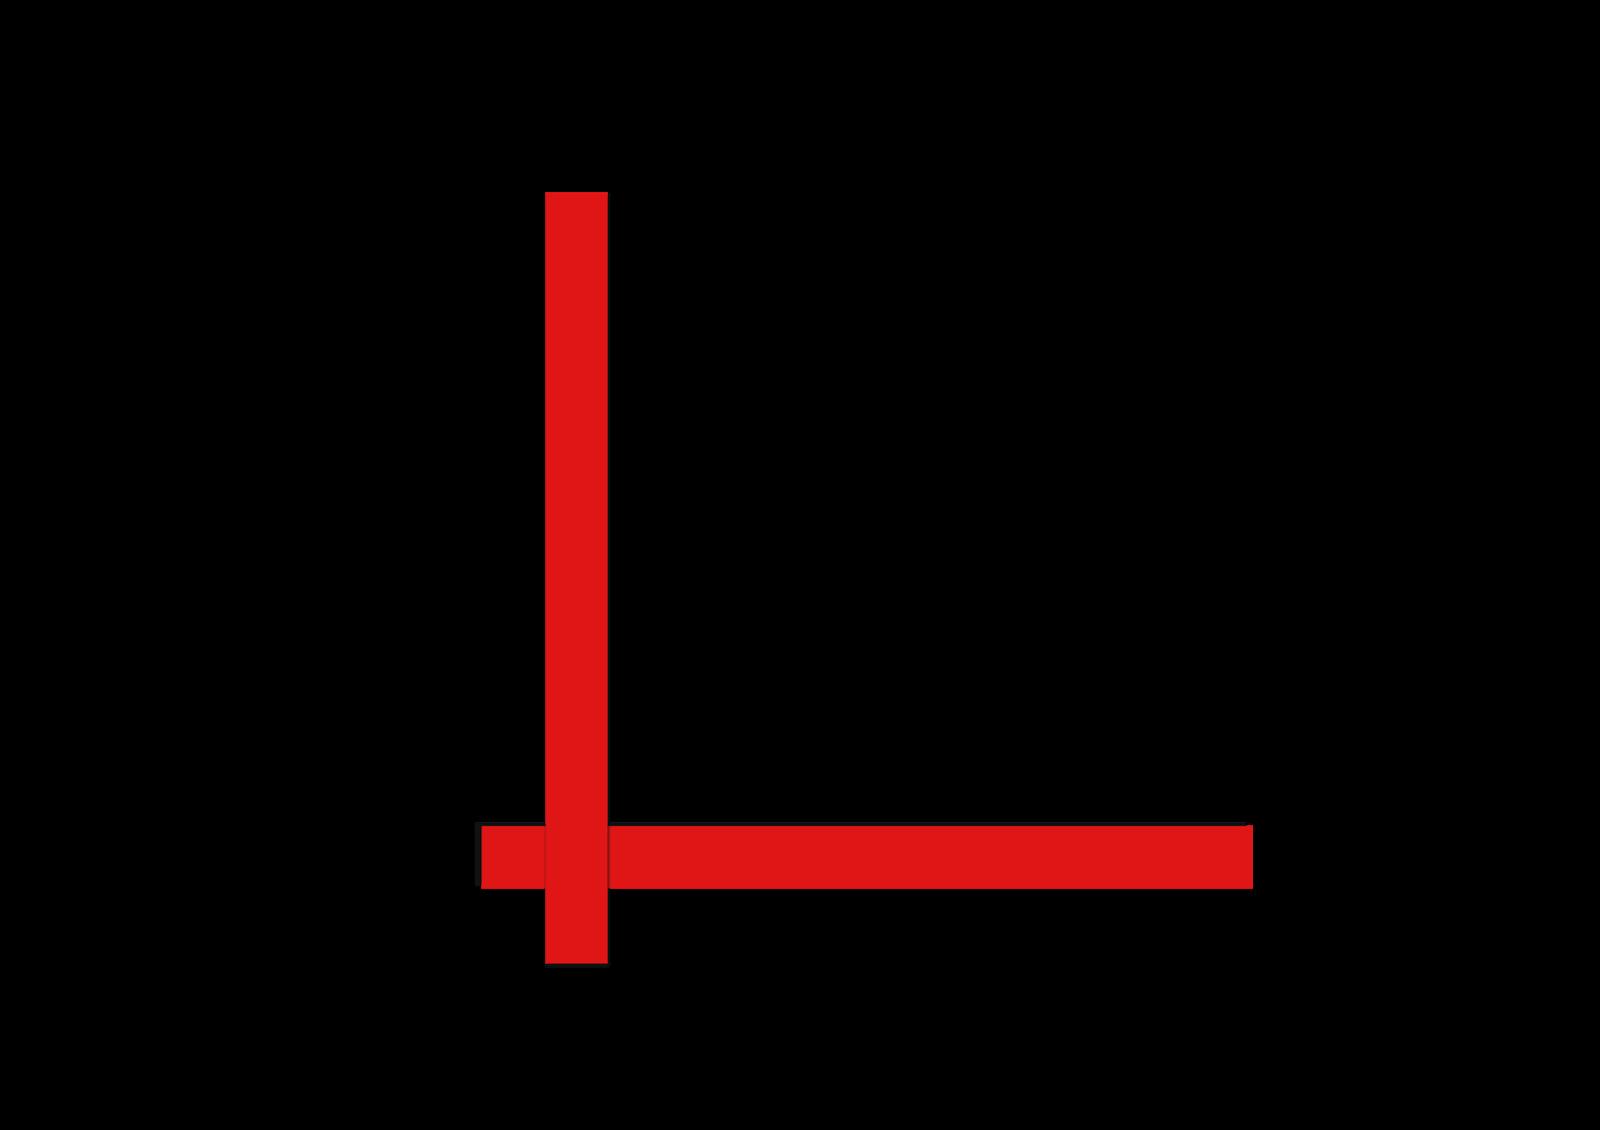 Mukana ram : NEW EDITING TOOLS - BRUSH + LOGO TOOLS AND WITH ZIP